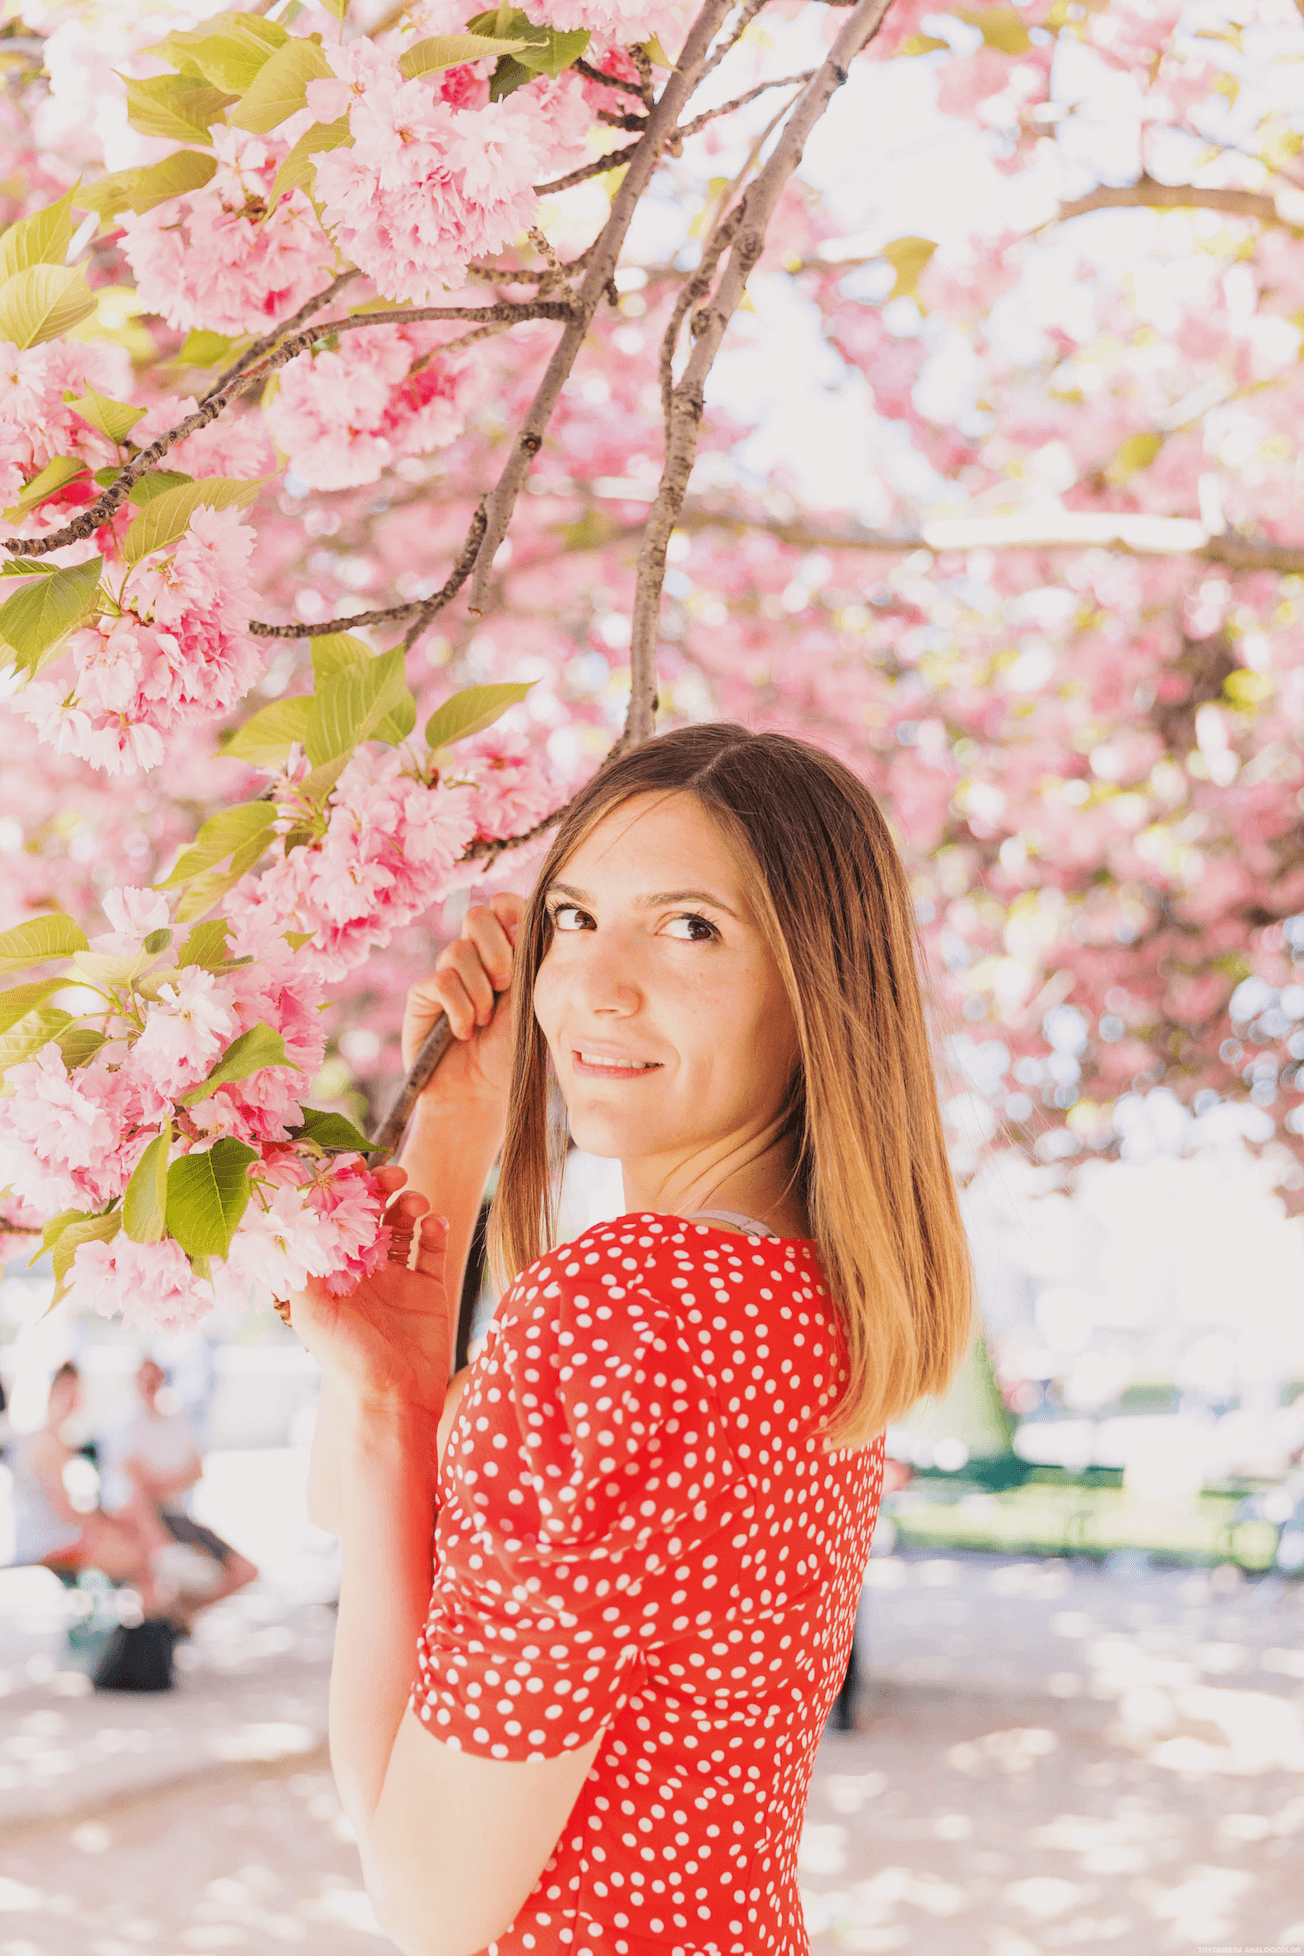 robe tendance pour le printemps